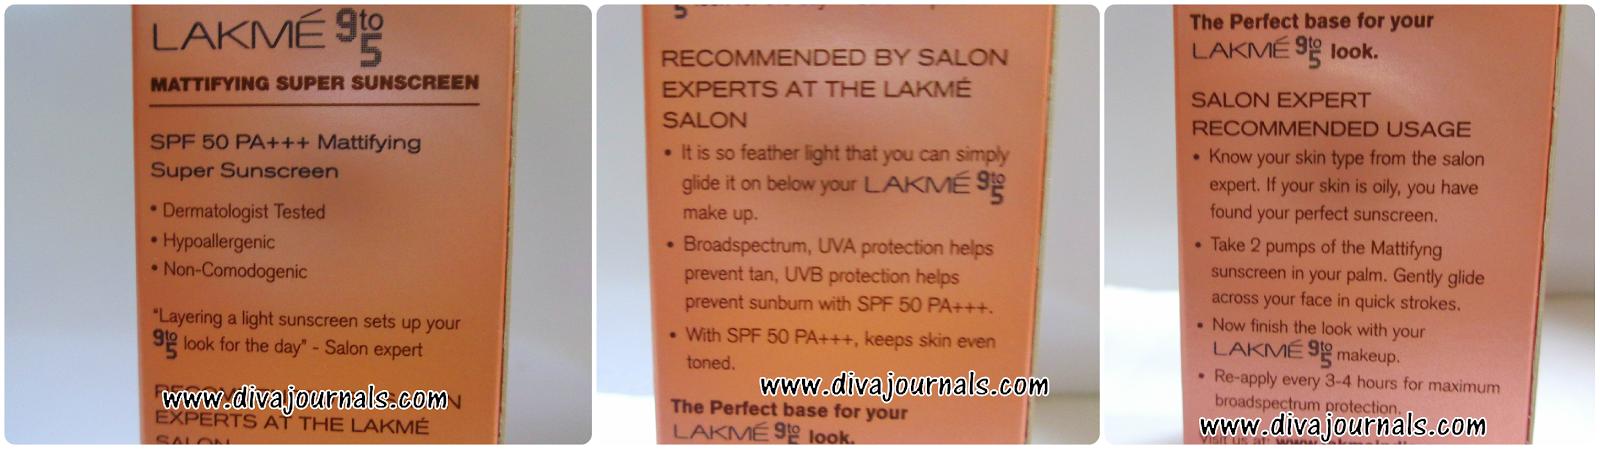 Lakme 9-to-5 Mattifying Super Sunscreen SPF 50 PA+++ Review